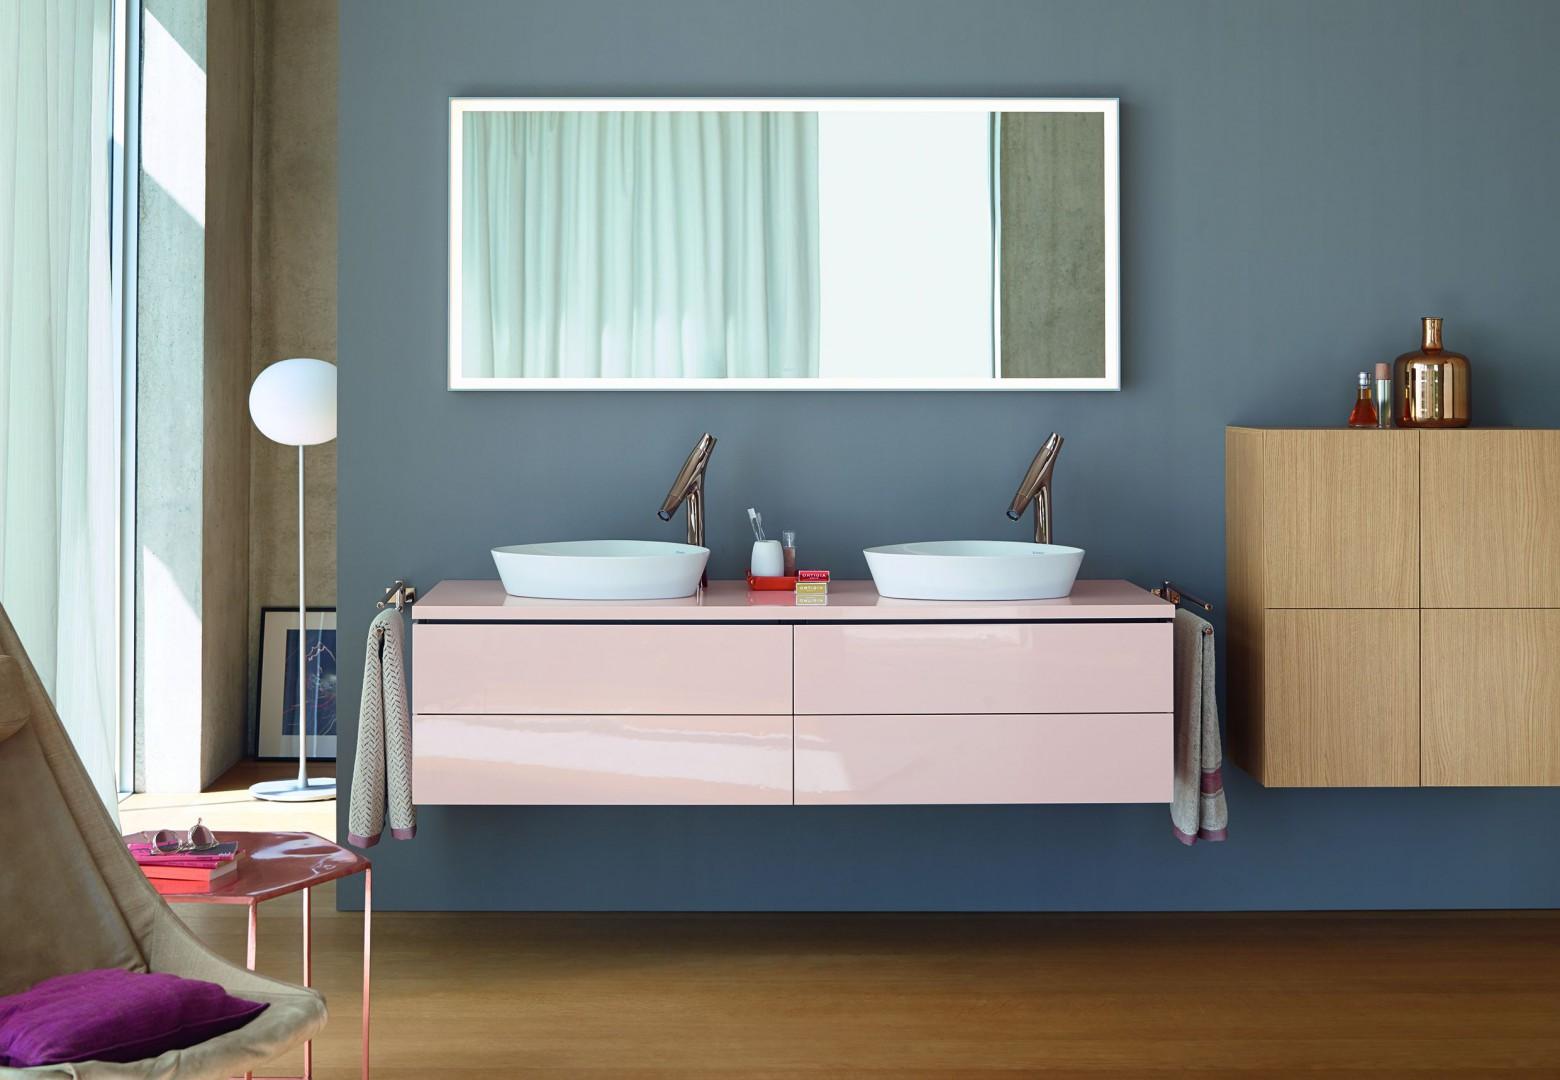 Kolekcja mebli łazienkowych L-Cube firmy Duravit. Fot. Duravit